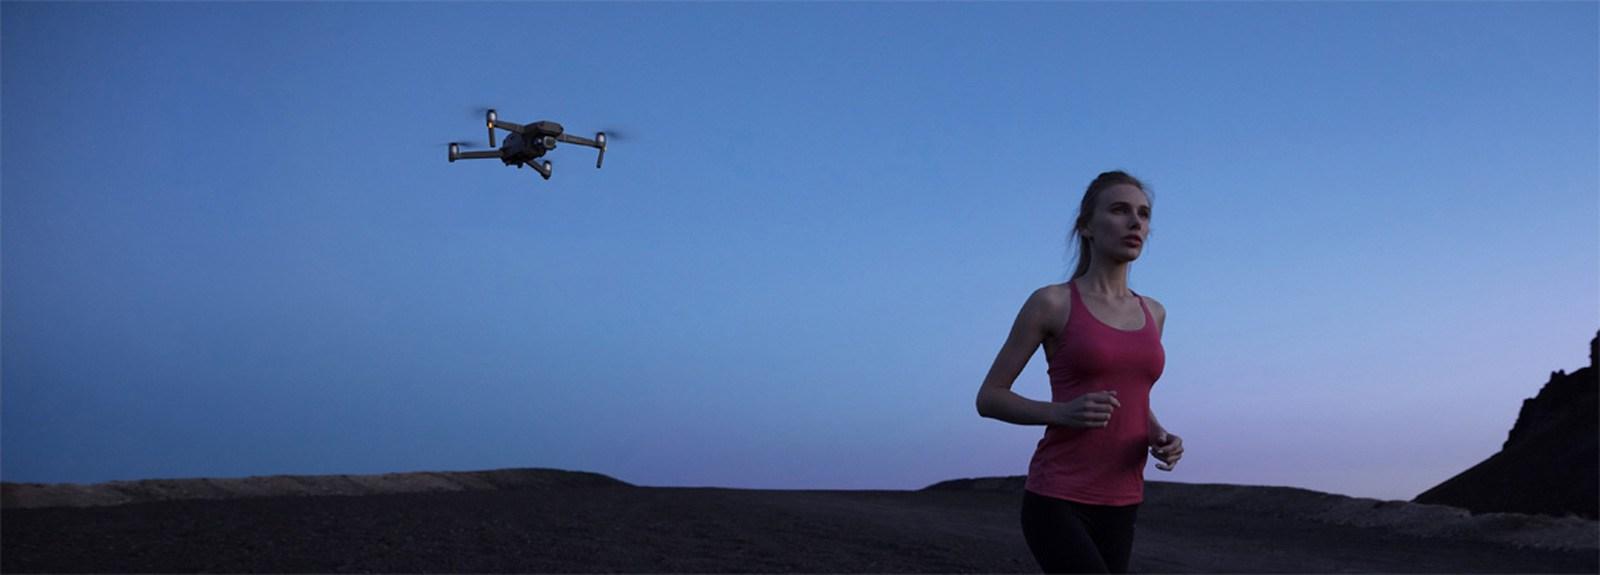 DJI Mavic 2 Zoom foldable drone